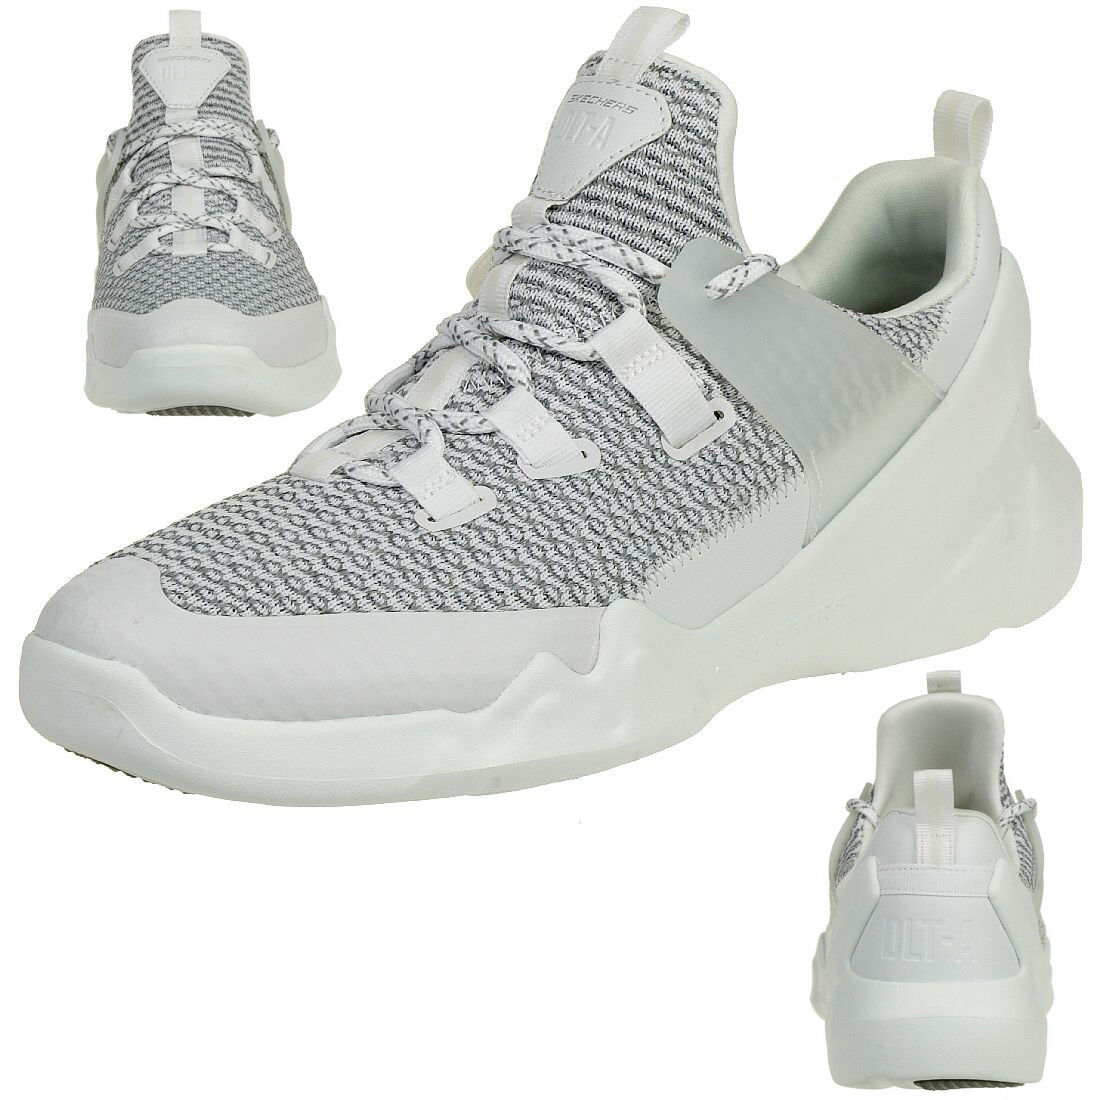 Skechers d 'Lites DLT-a señores air cooled memory foam cortos entrenador blancoo gris